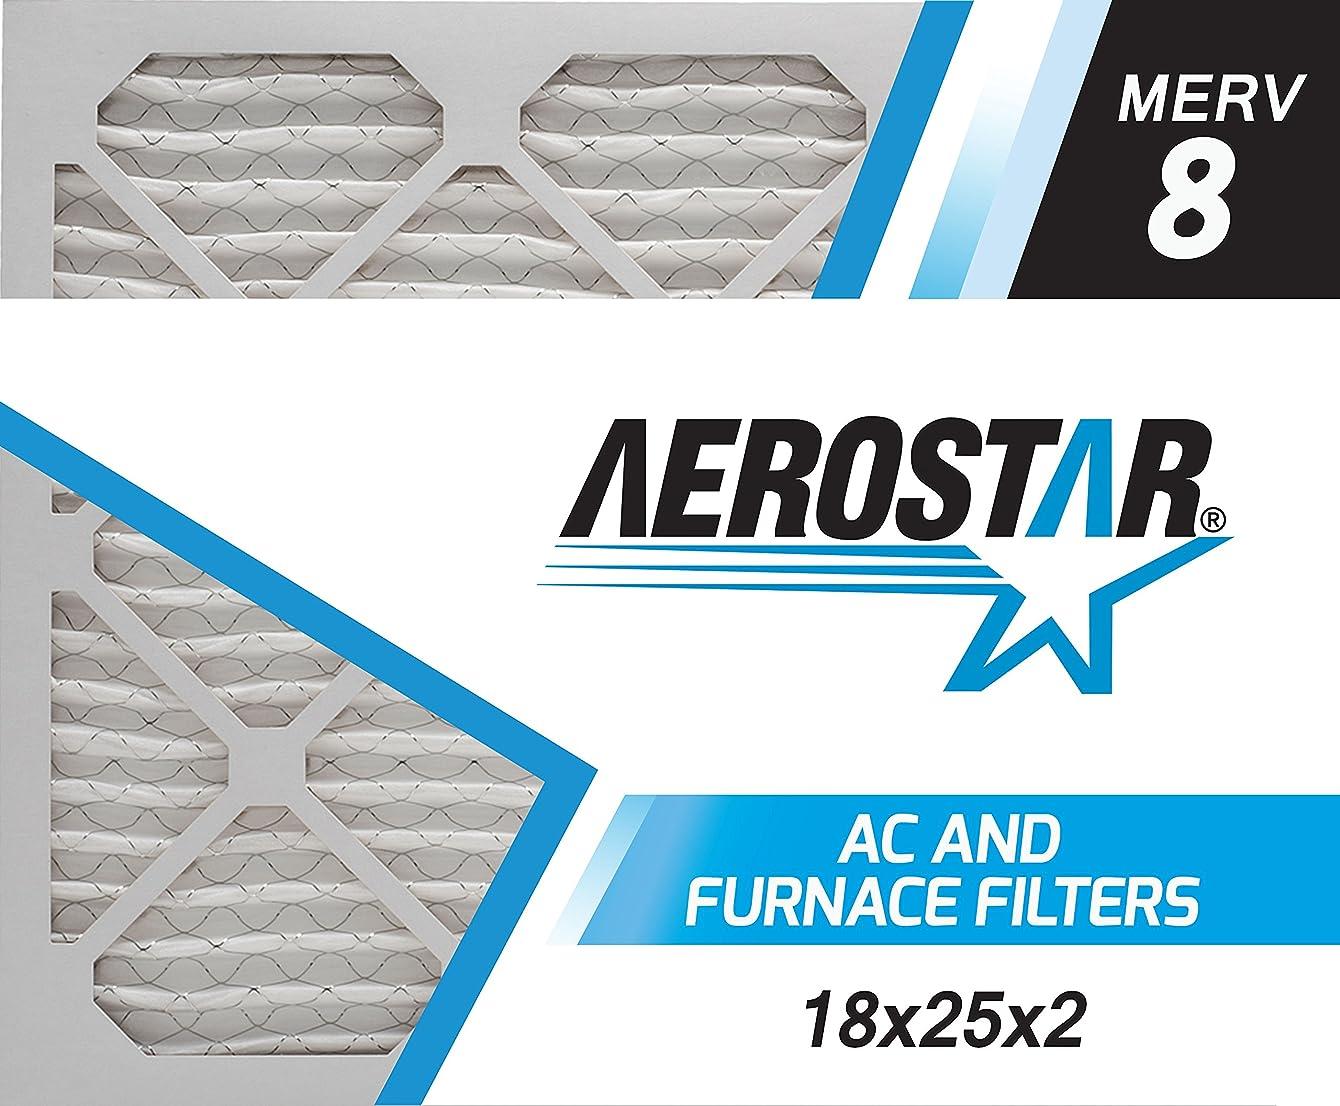 Aerostar 18x25x2 MERV 8, Pleated Air Filter, 18x25x2, Box of 6, Made in The USA